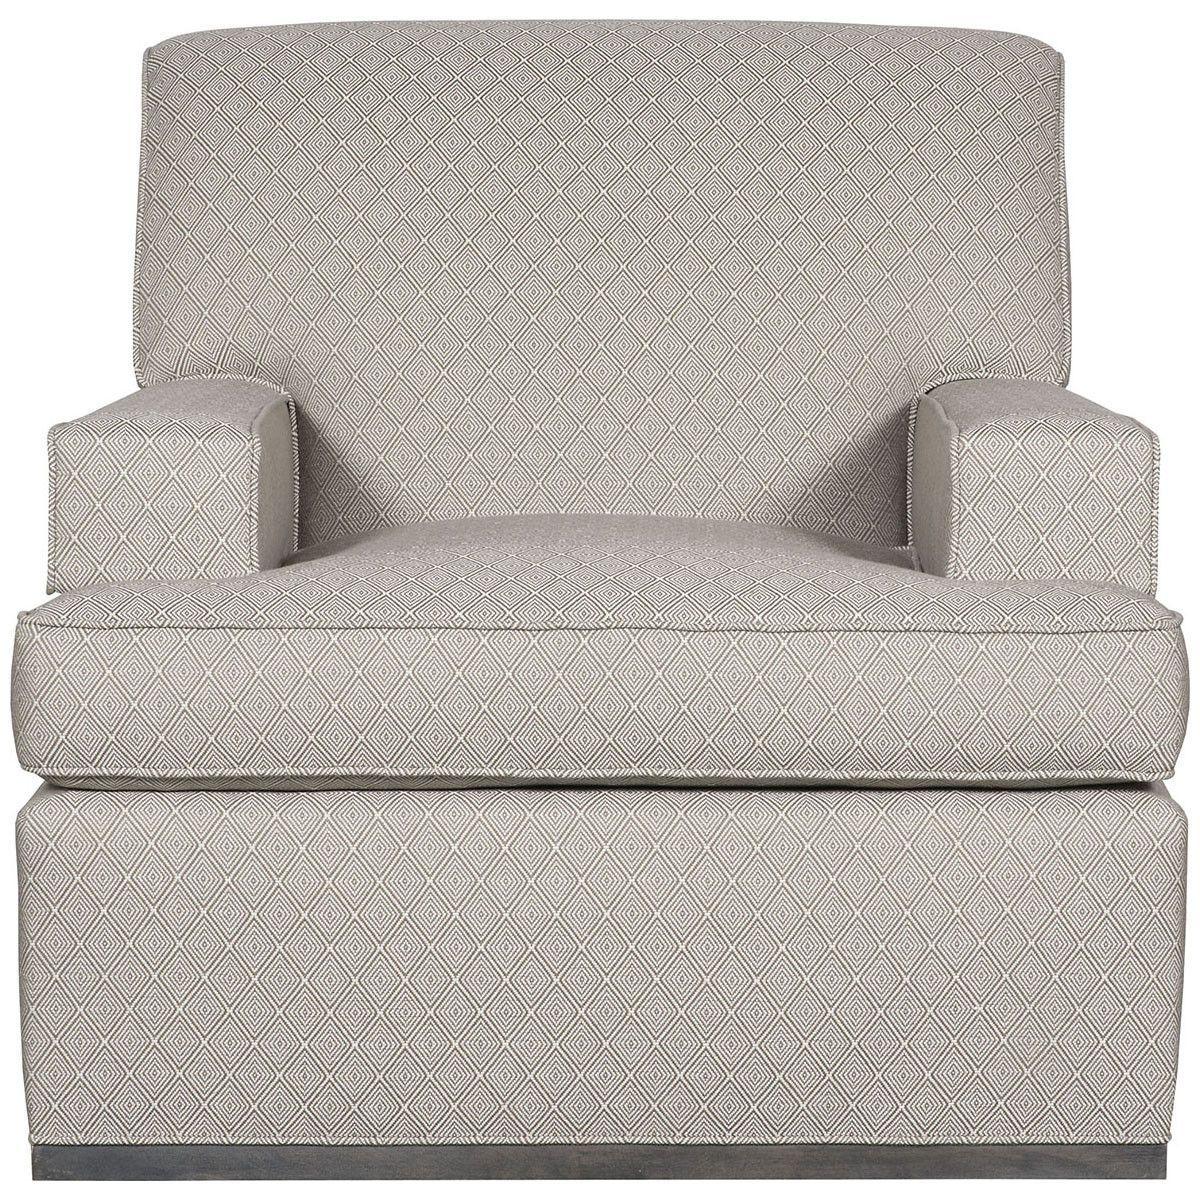 Vanguard Furniture Hobart Graphite Panos Swivel Chair